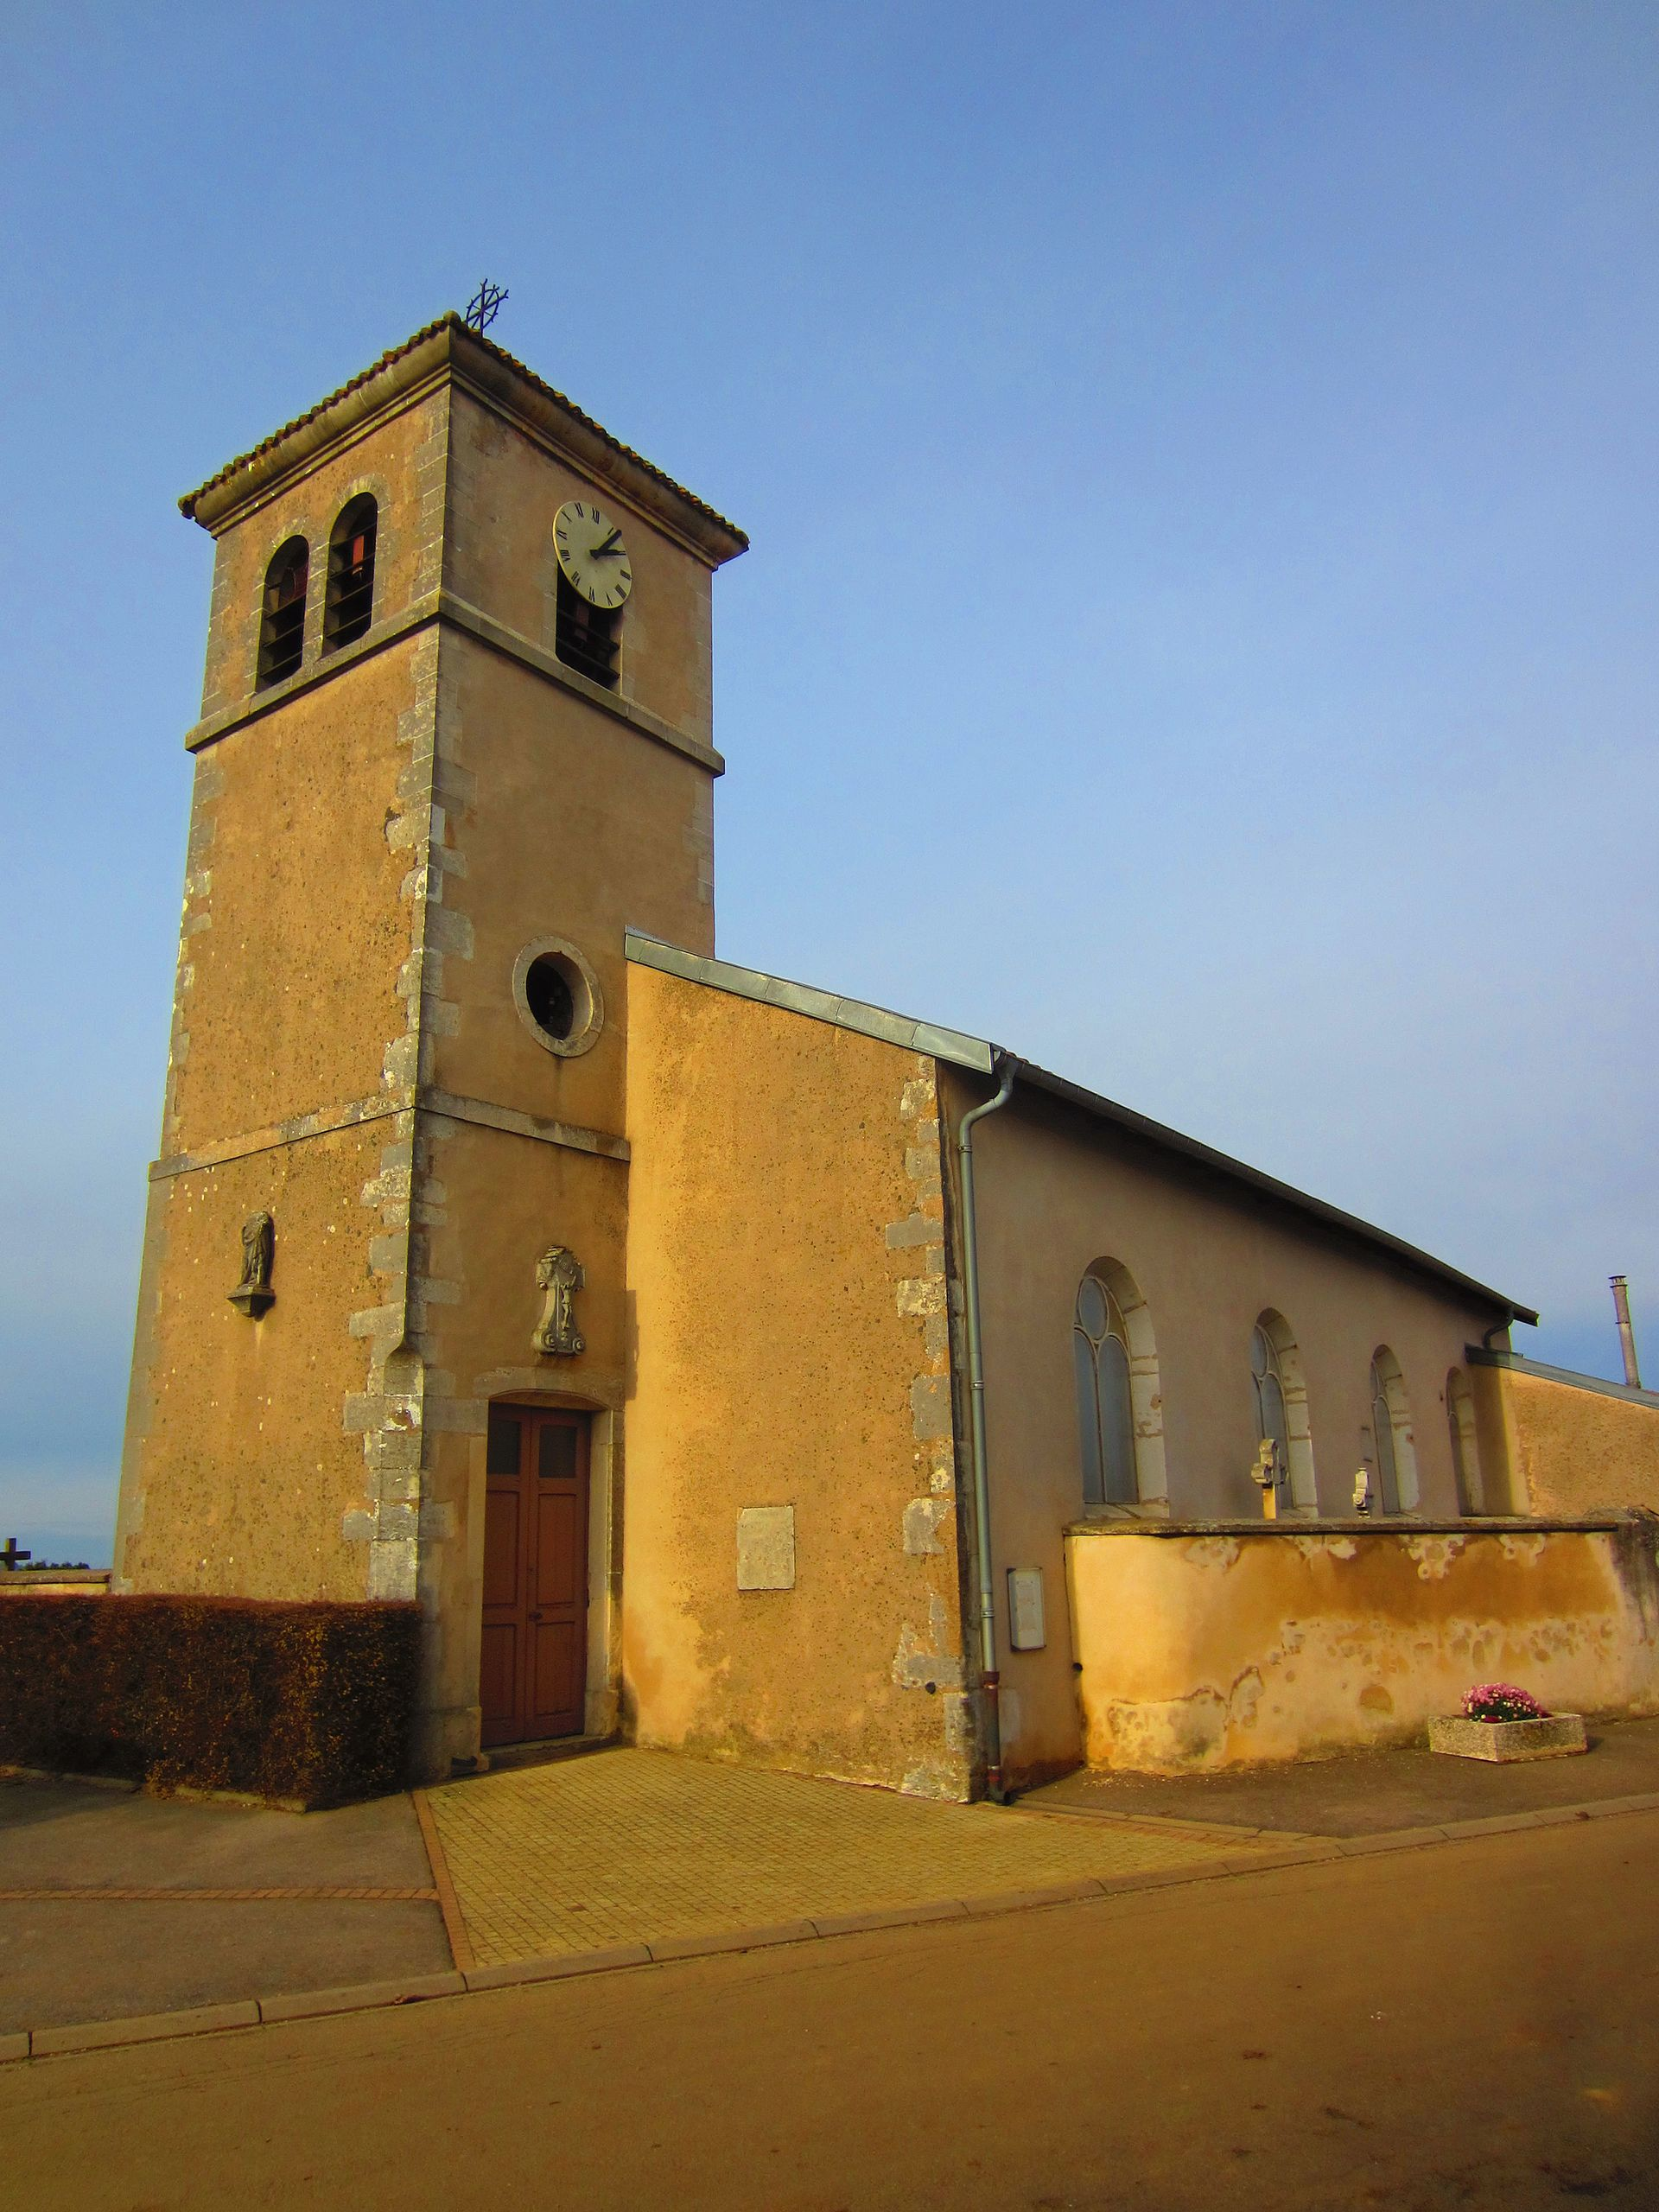 Sainte genevi ve wikidata - Piscine sainte genevieve ...